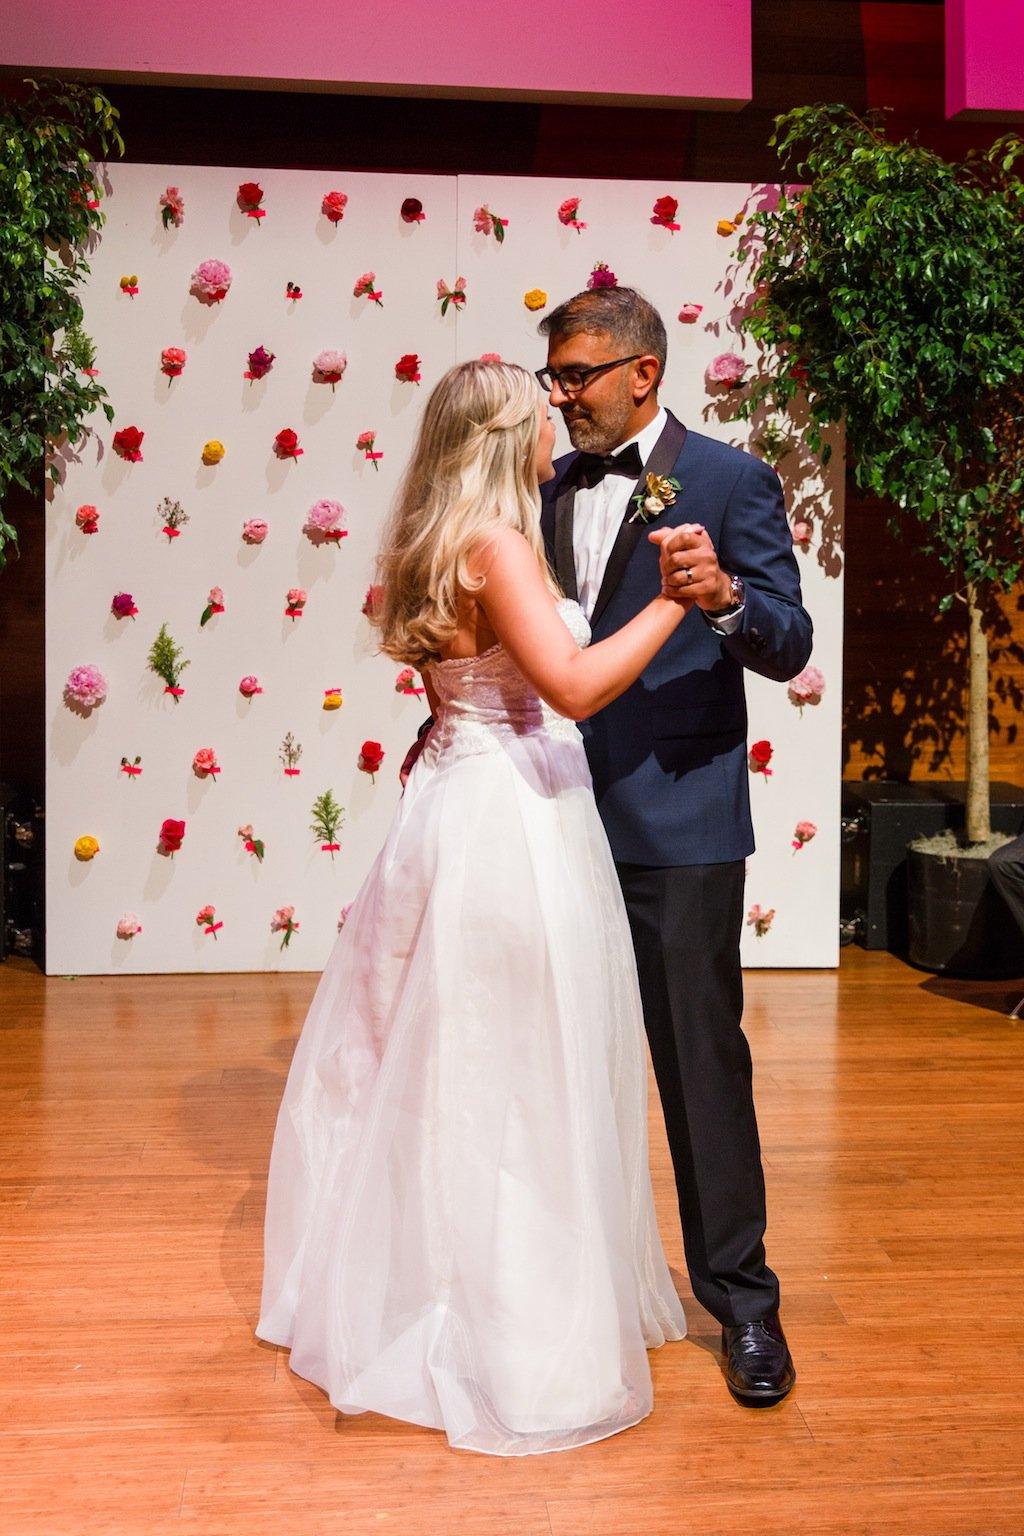 1-19-16-fuchsia-modern-wedding-artisphere-20